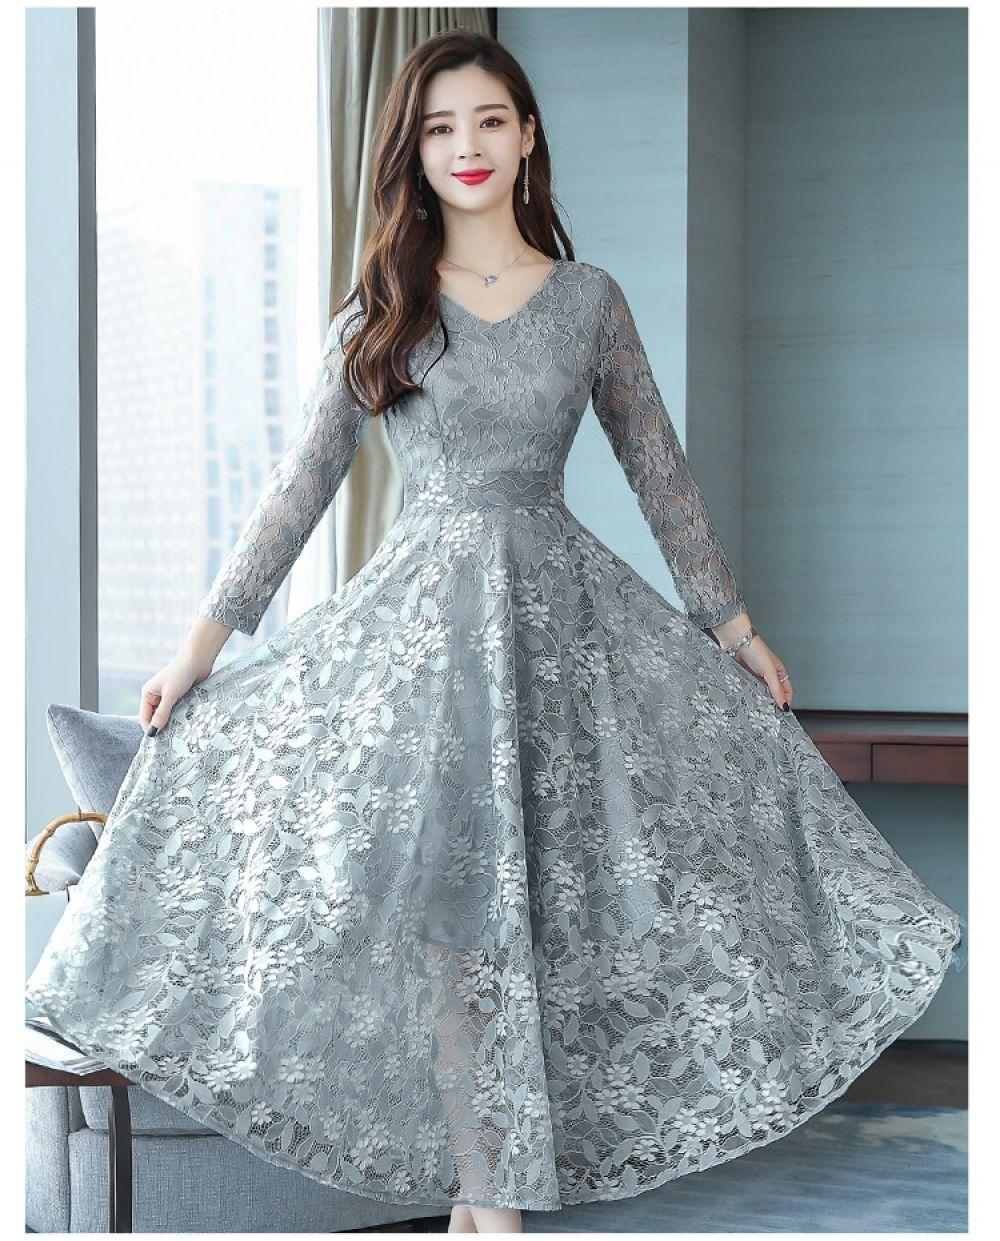 Autumn Fashion Romantic Lace Pink Female Dress The 2018 New Style V-neck  Designs Elegant 71e0fb0ab536